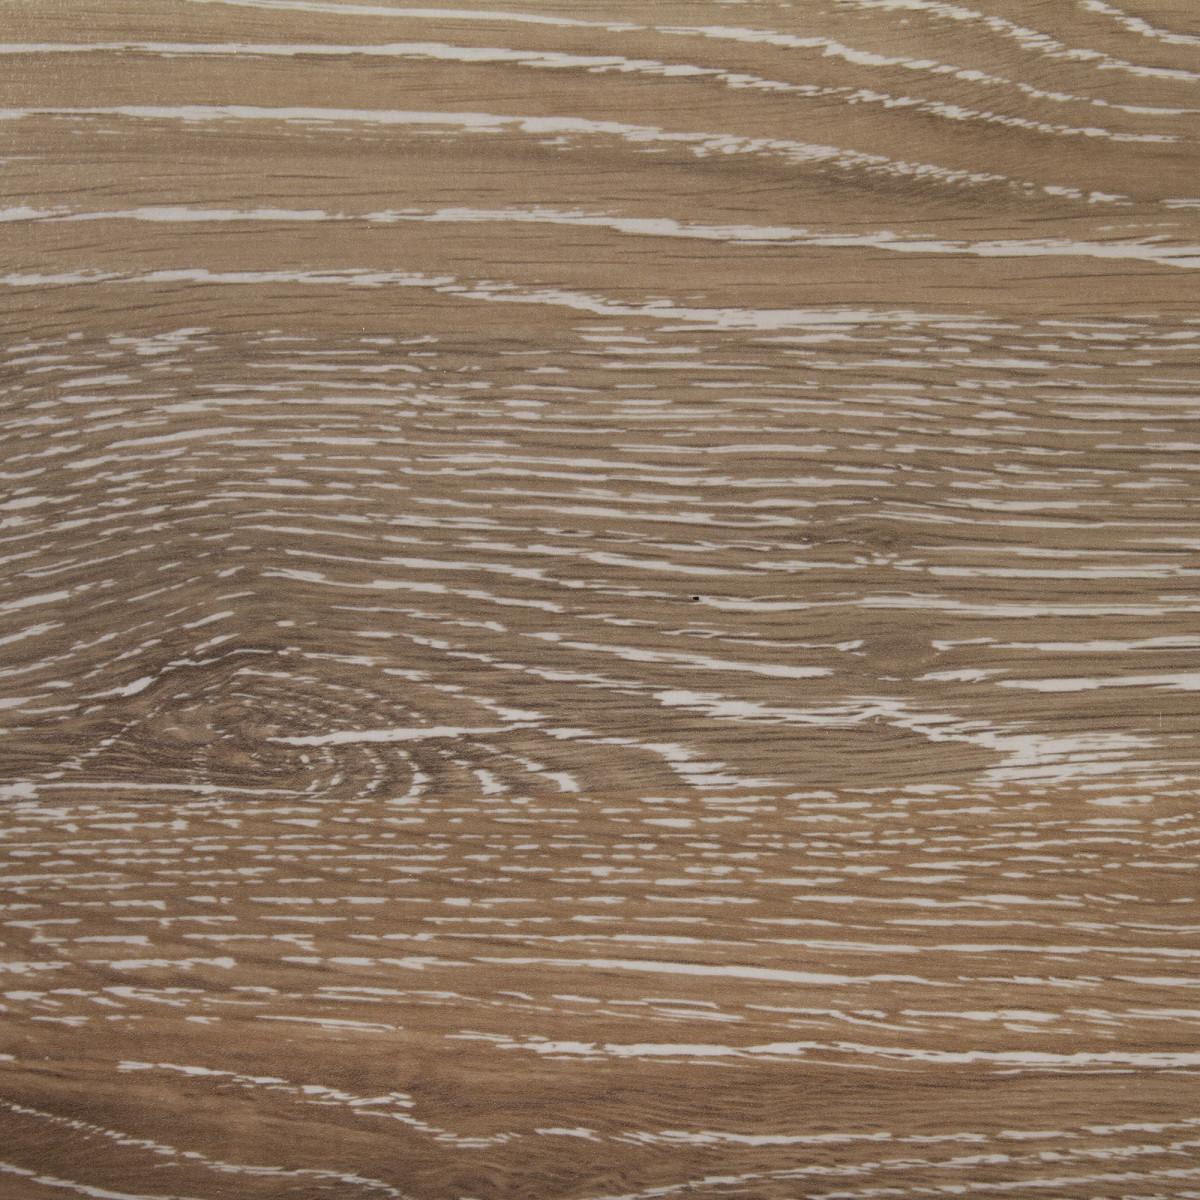 Ламинат Дуб серебристый 32 класс толщина 8 мм 2.131 м²